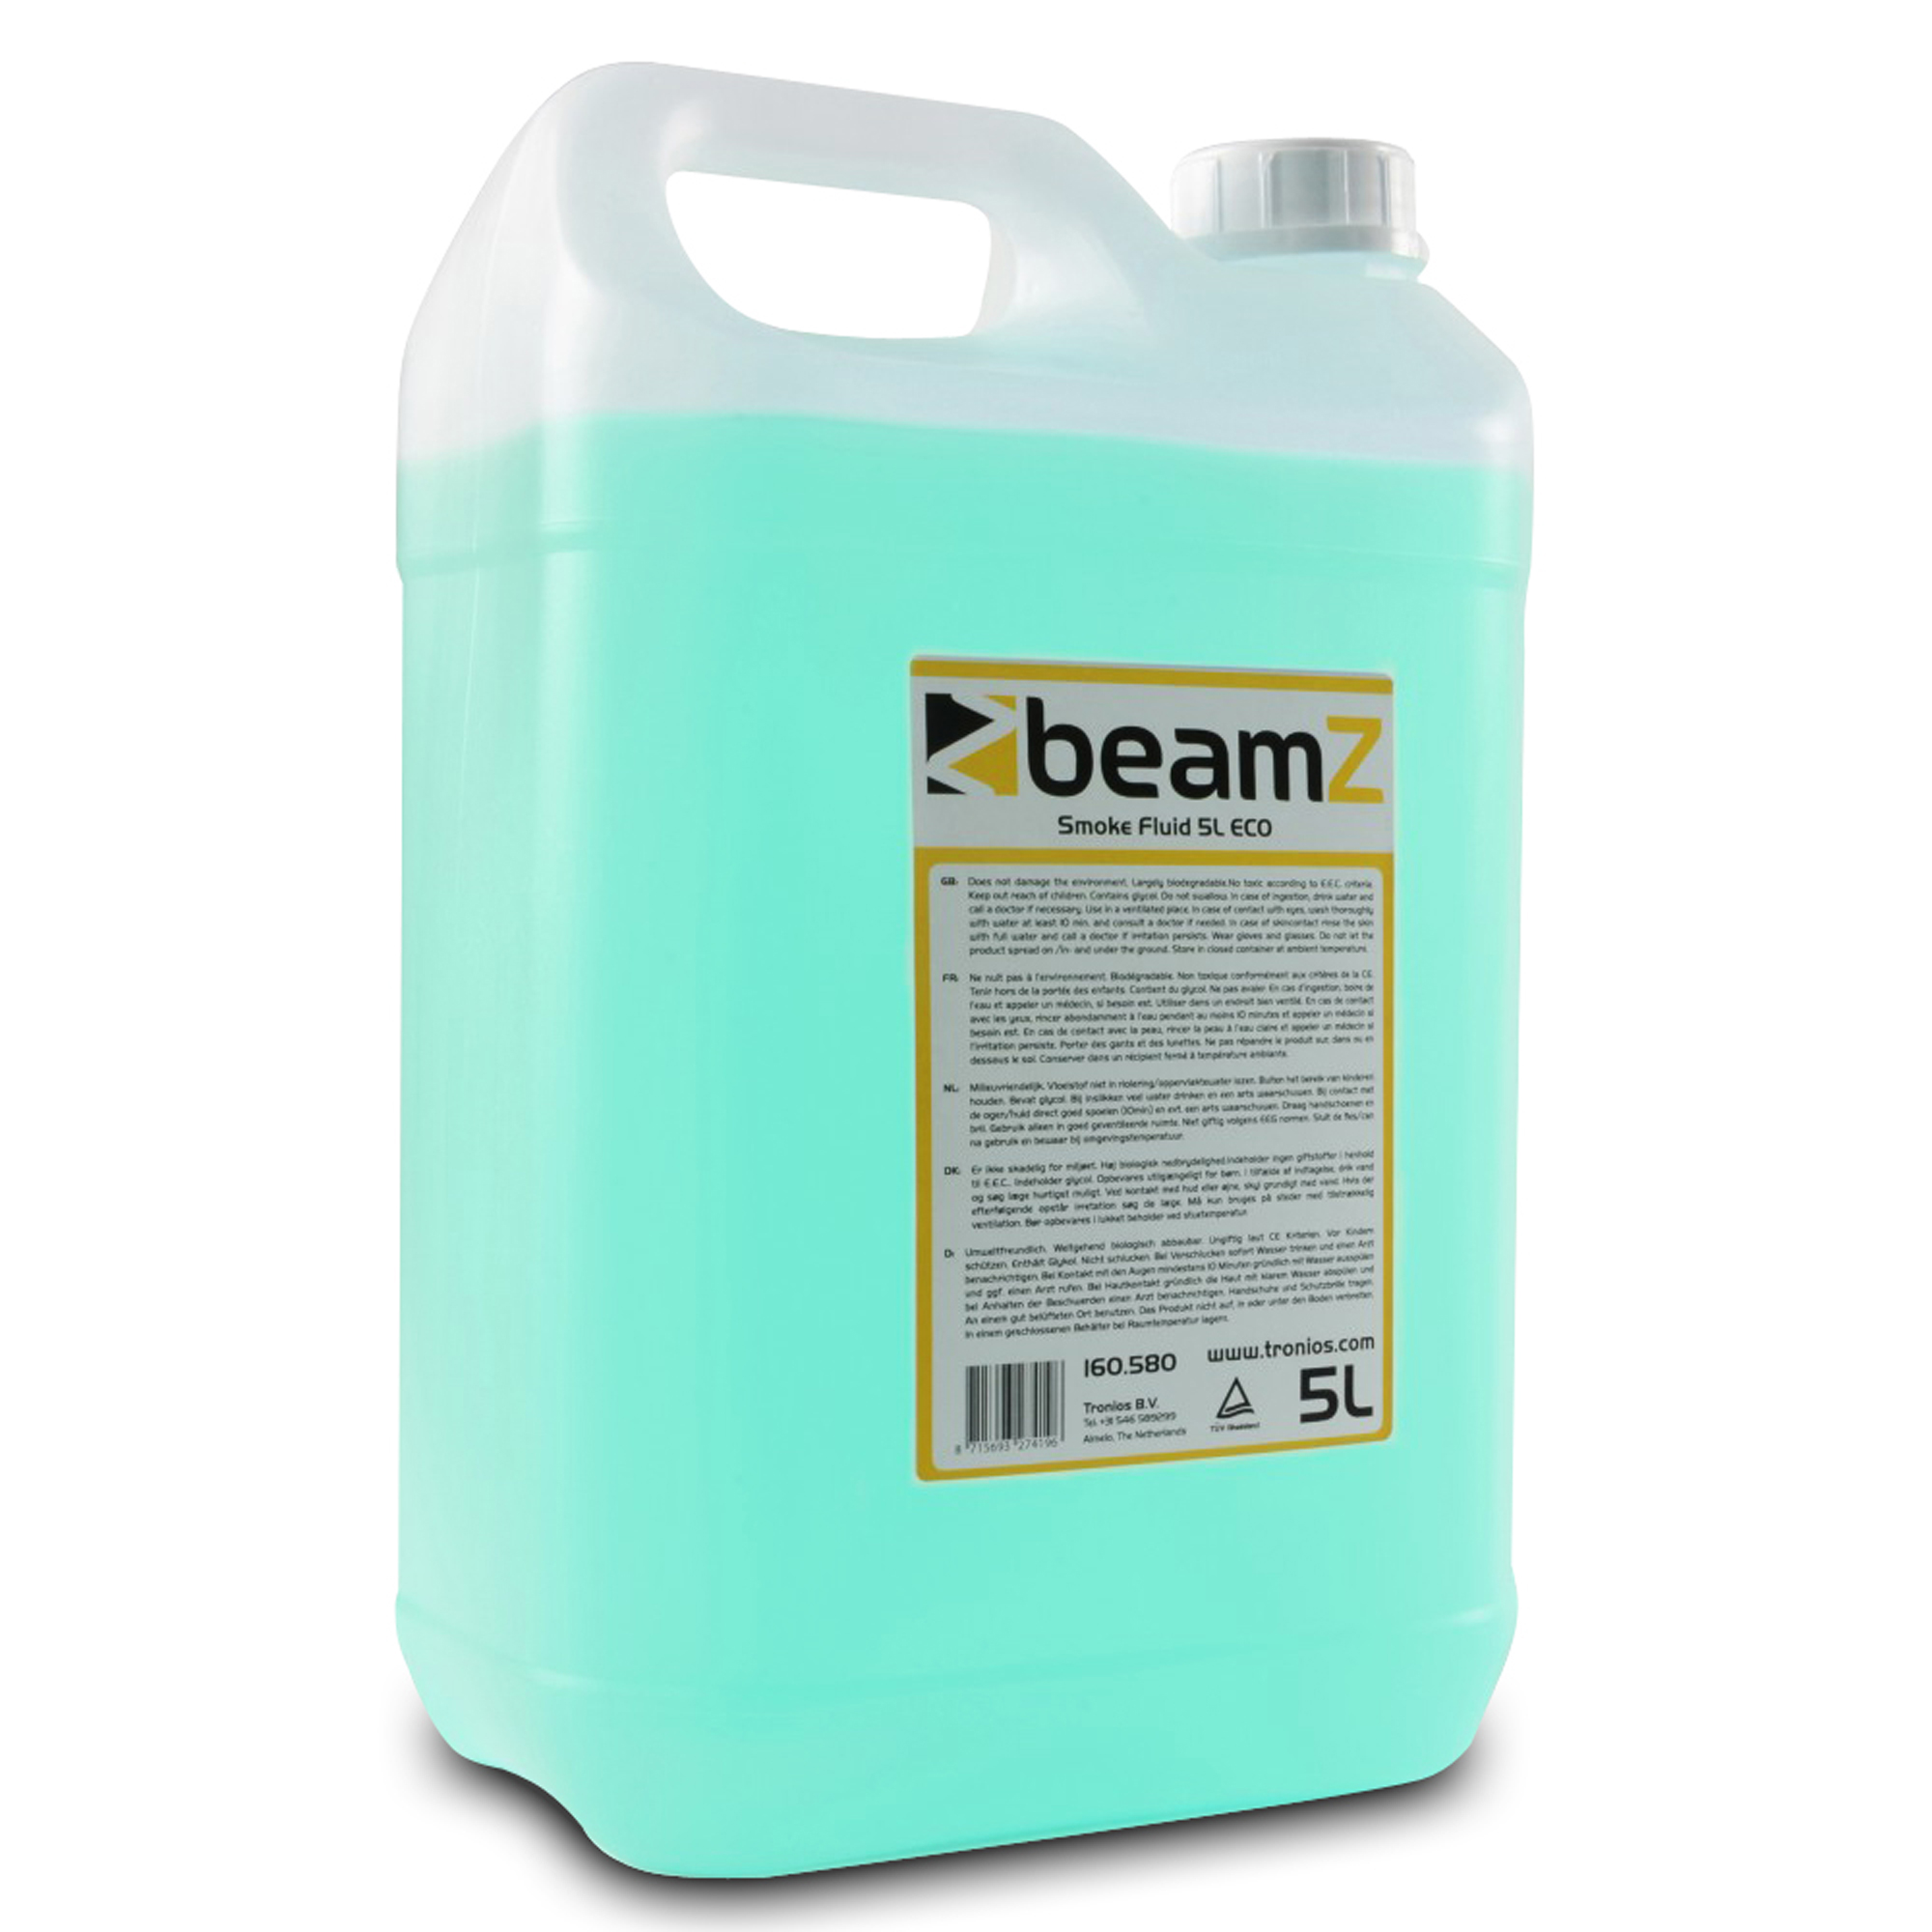 BeamZ 5L Eco Light Green Smoke Fluid